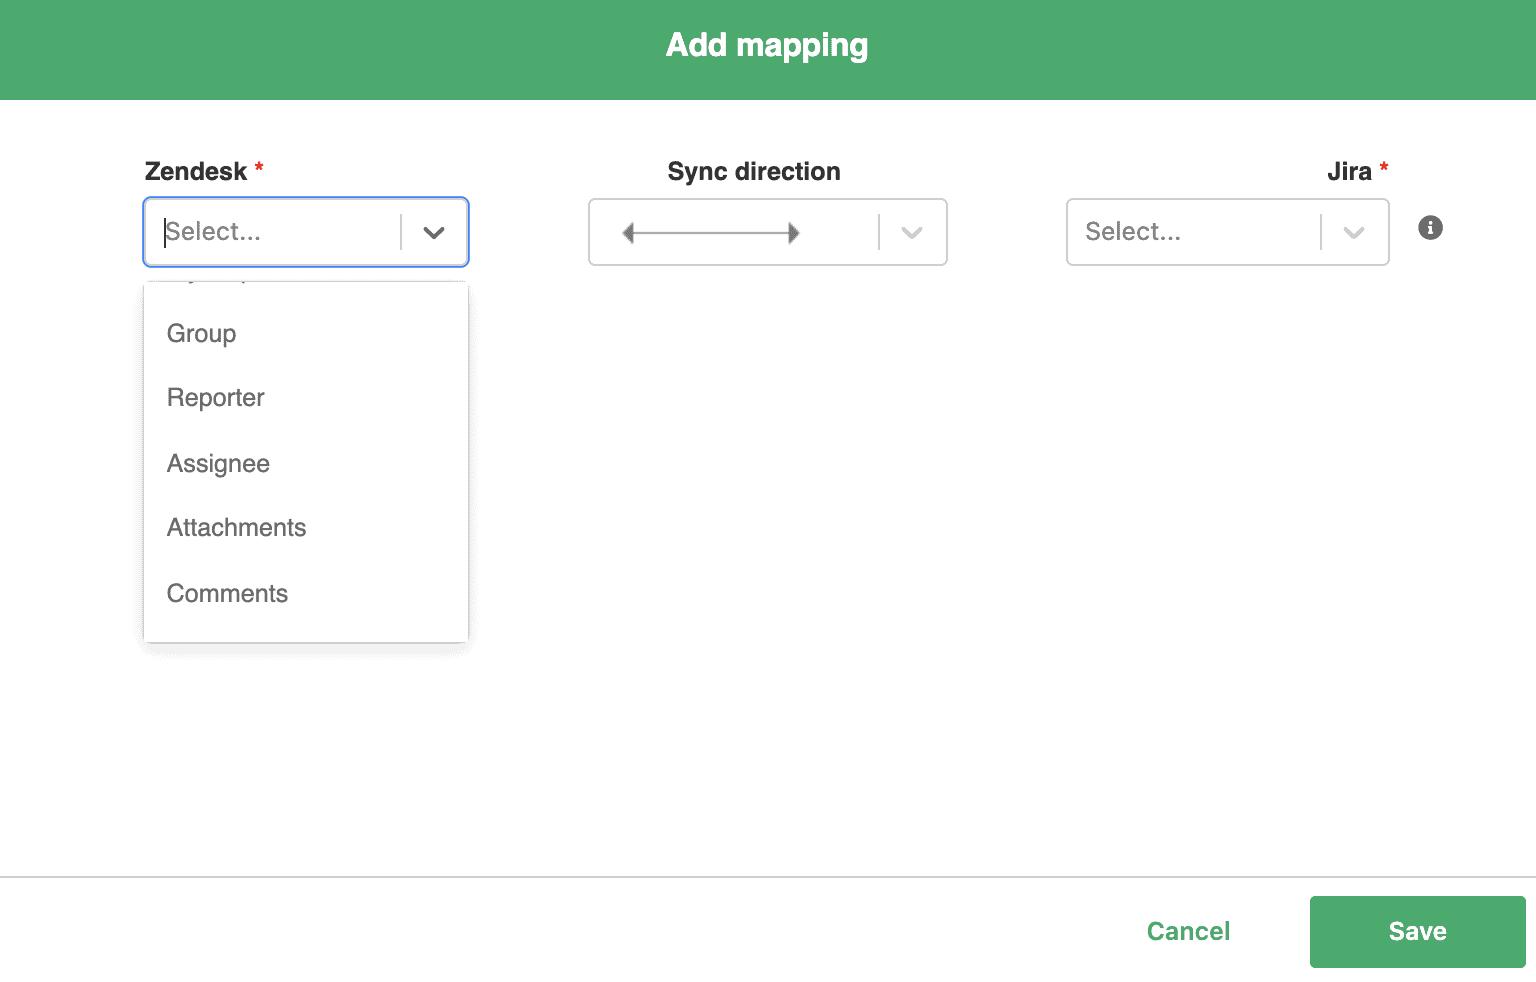 add mapping to jira zendesk sync